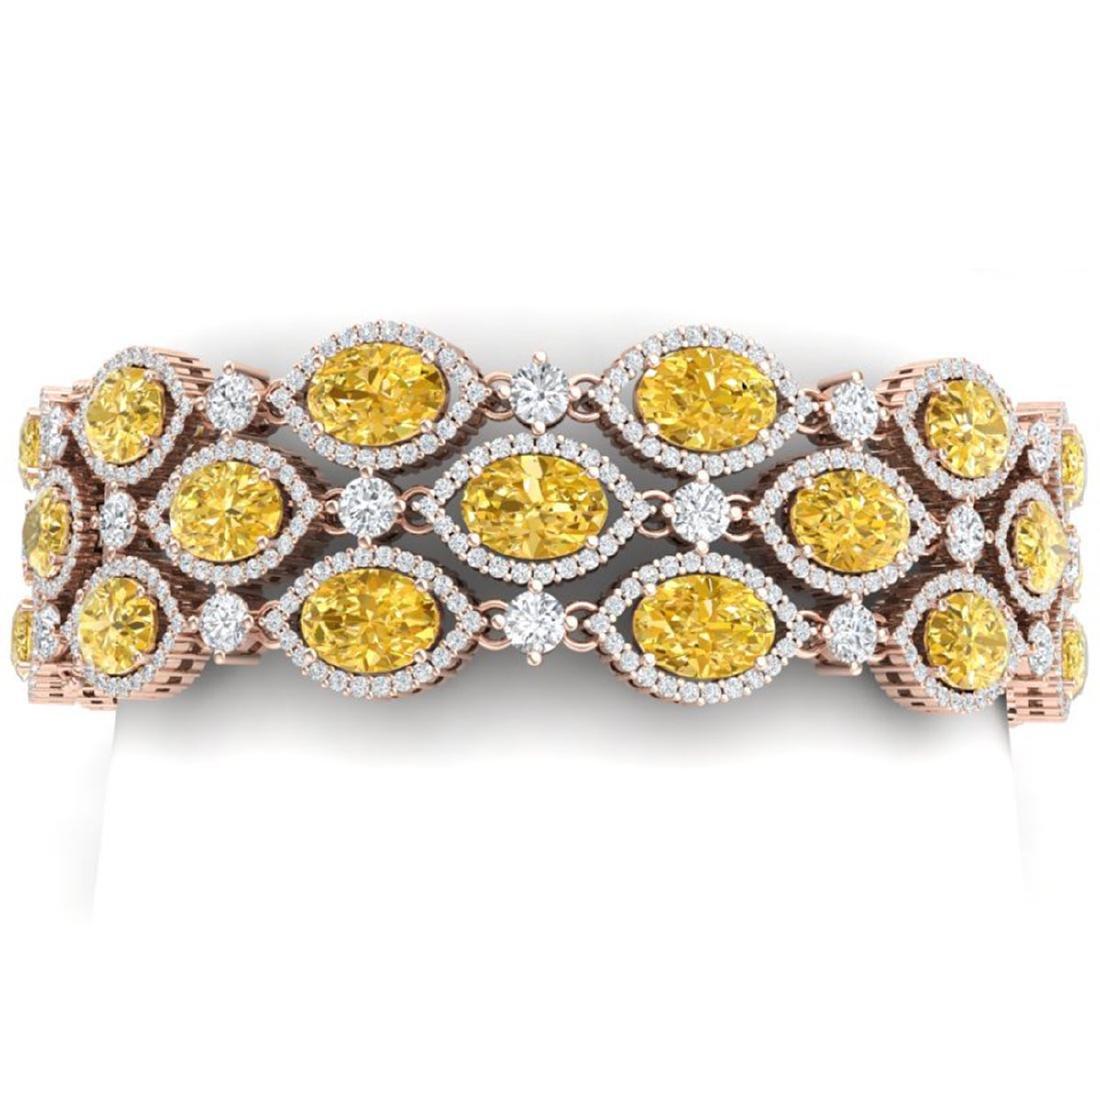 43.84 ctw Canary Citrine & VS Diamond Bracelet 18K Rose